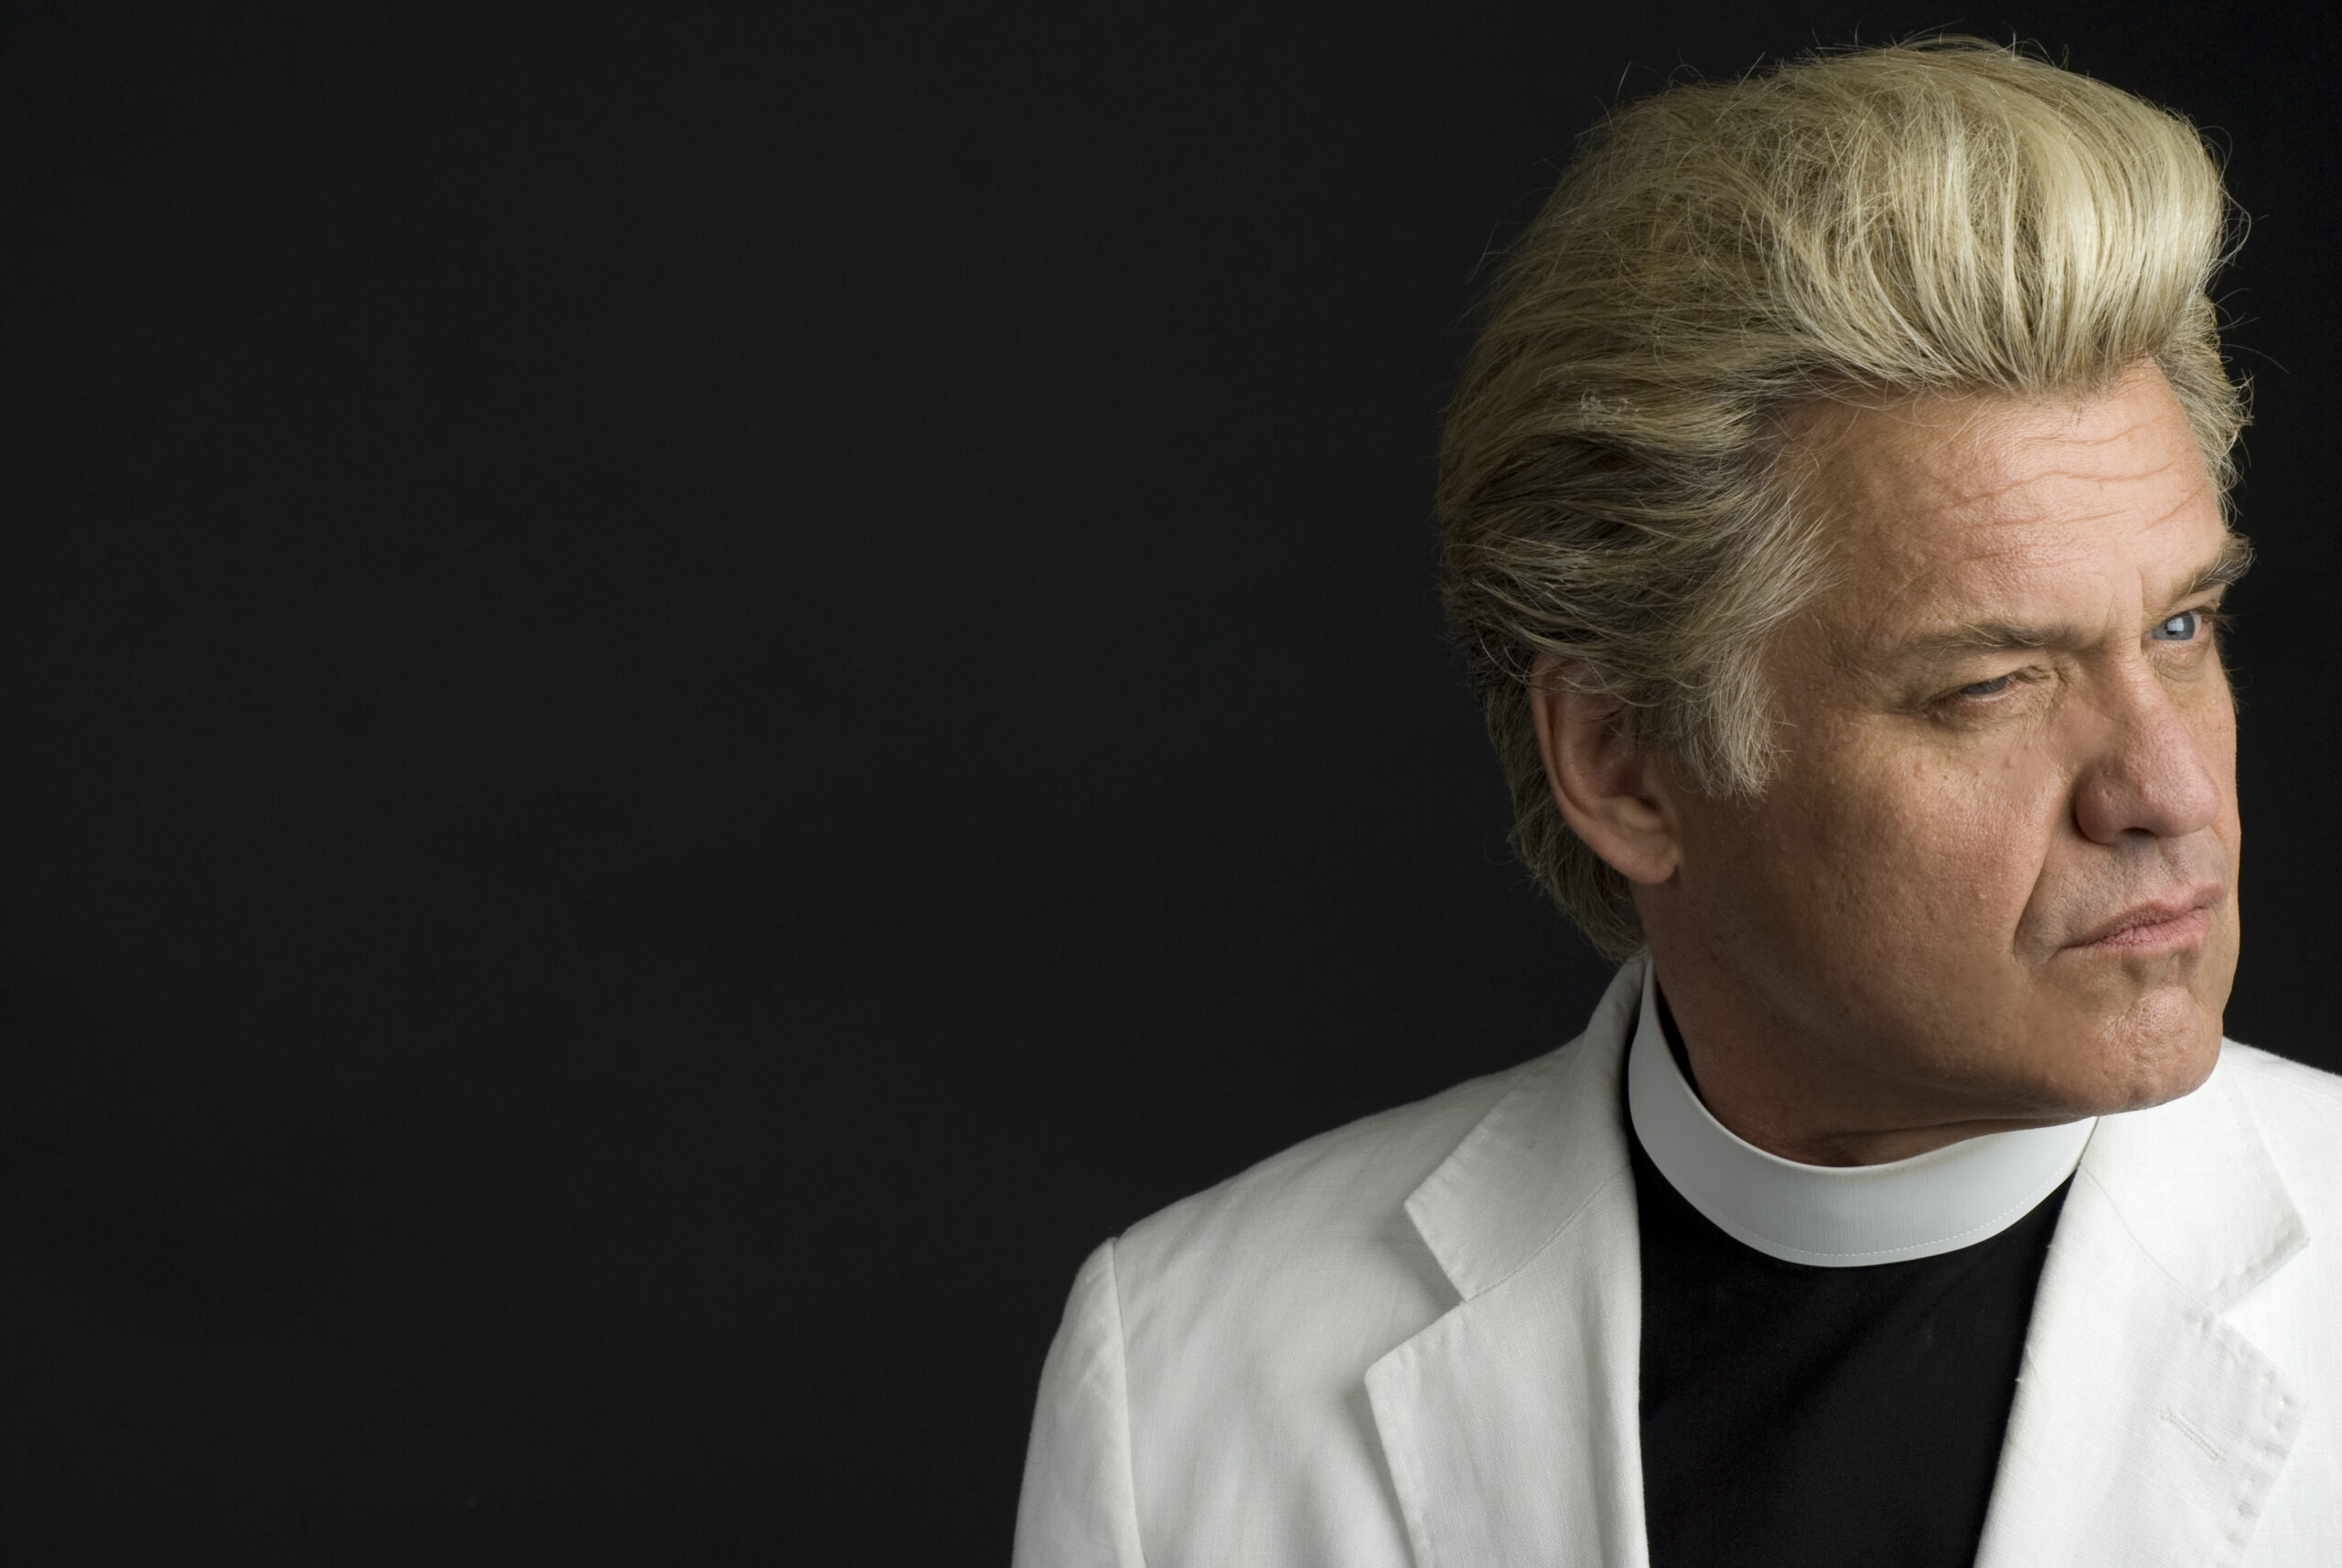 Reverend Billy Talen headshot